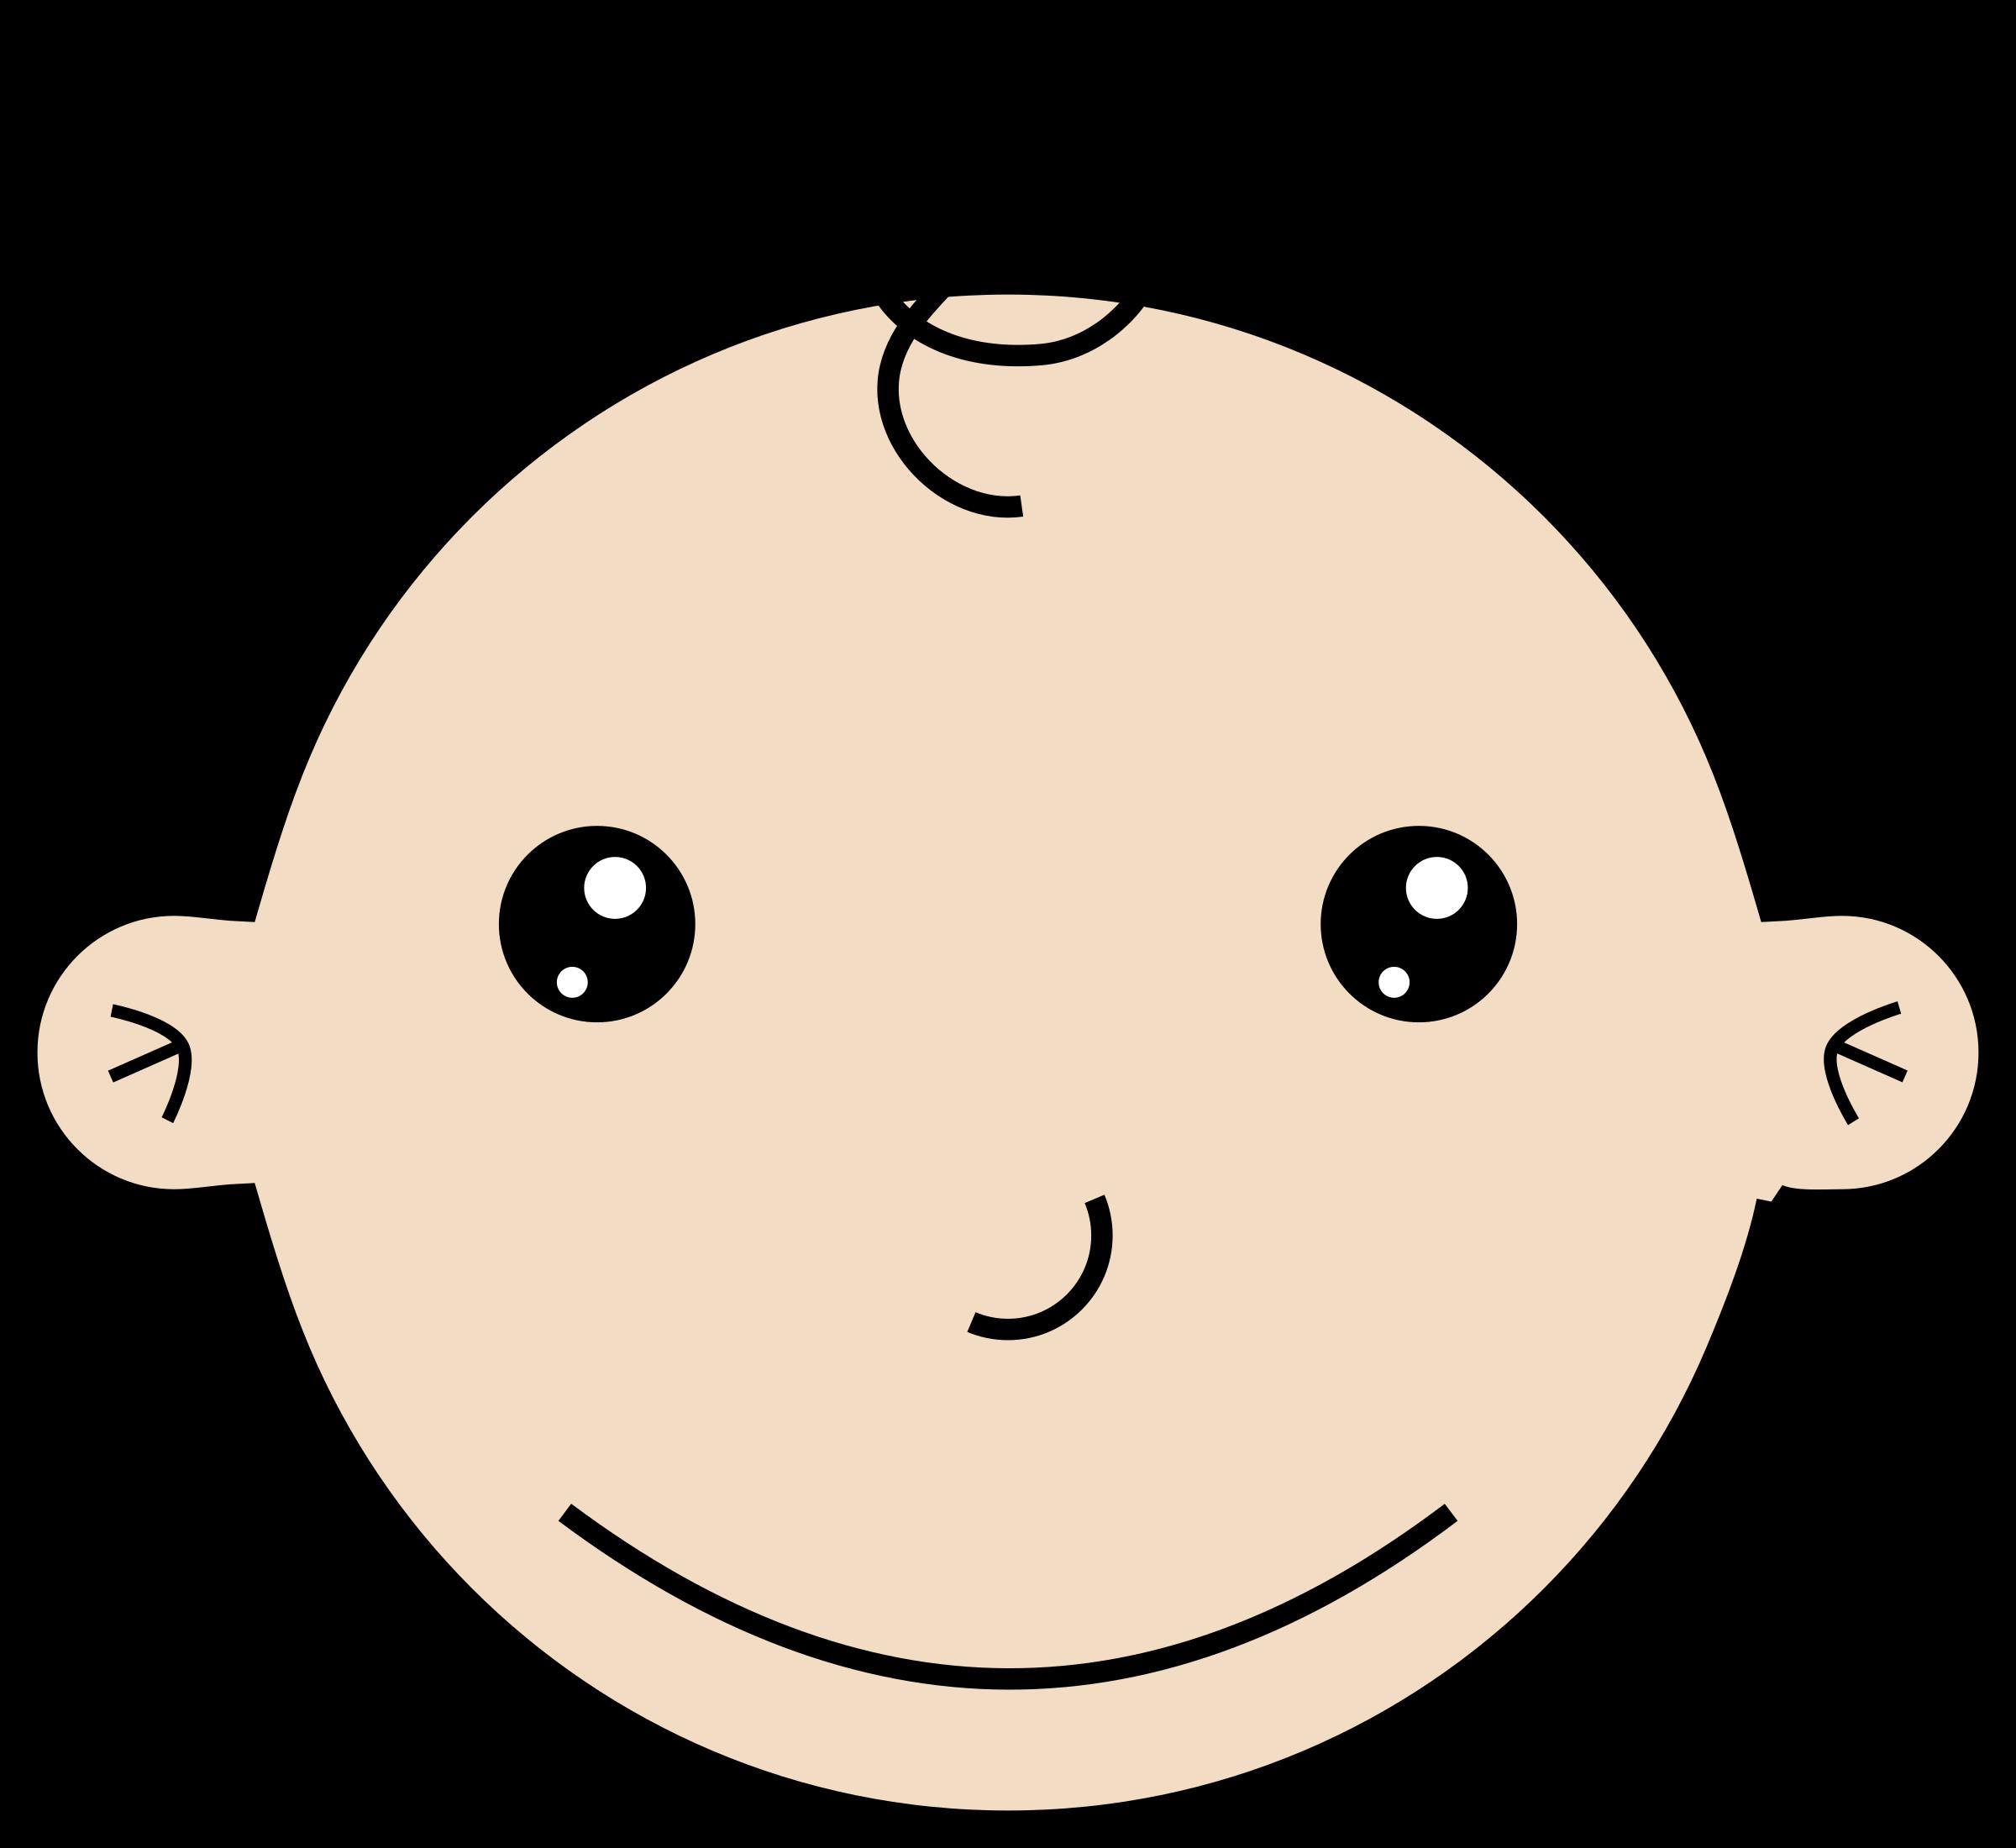 Contractor clipart sad. Smiling baby big image